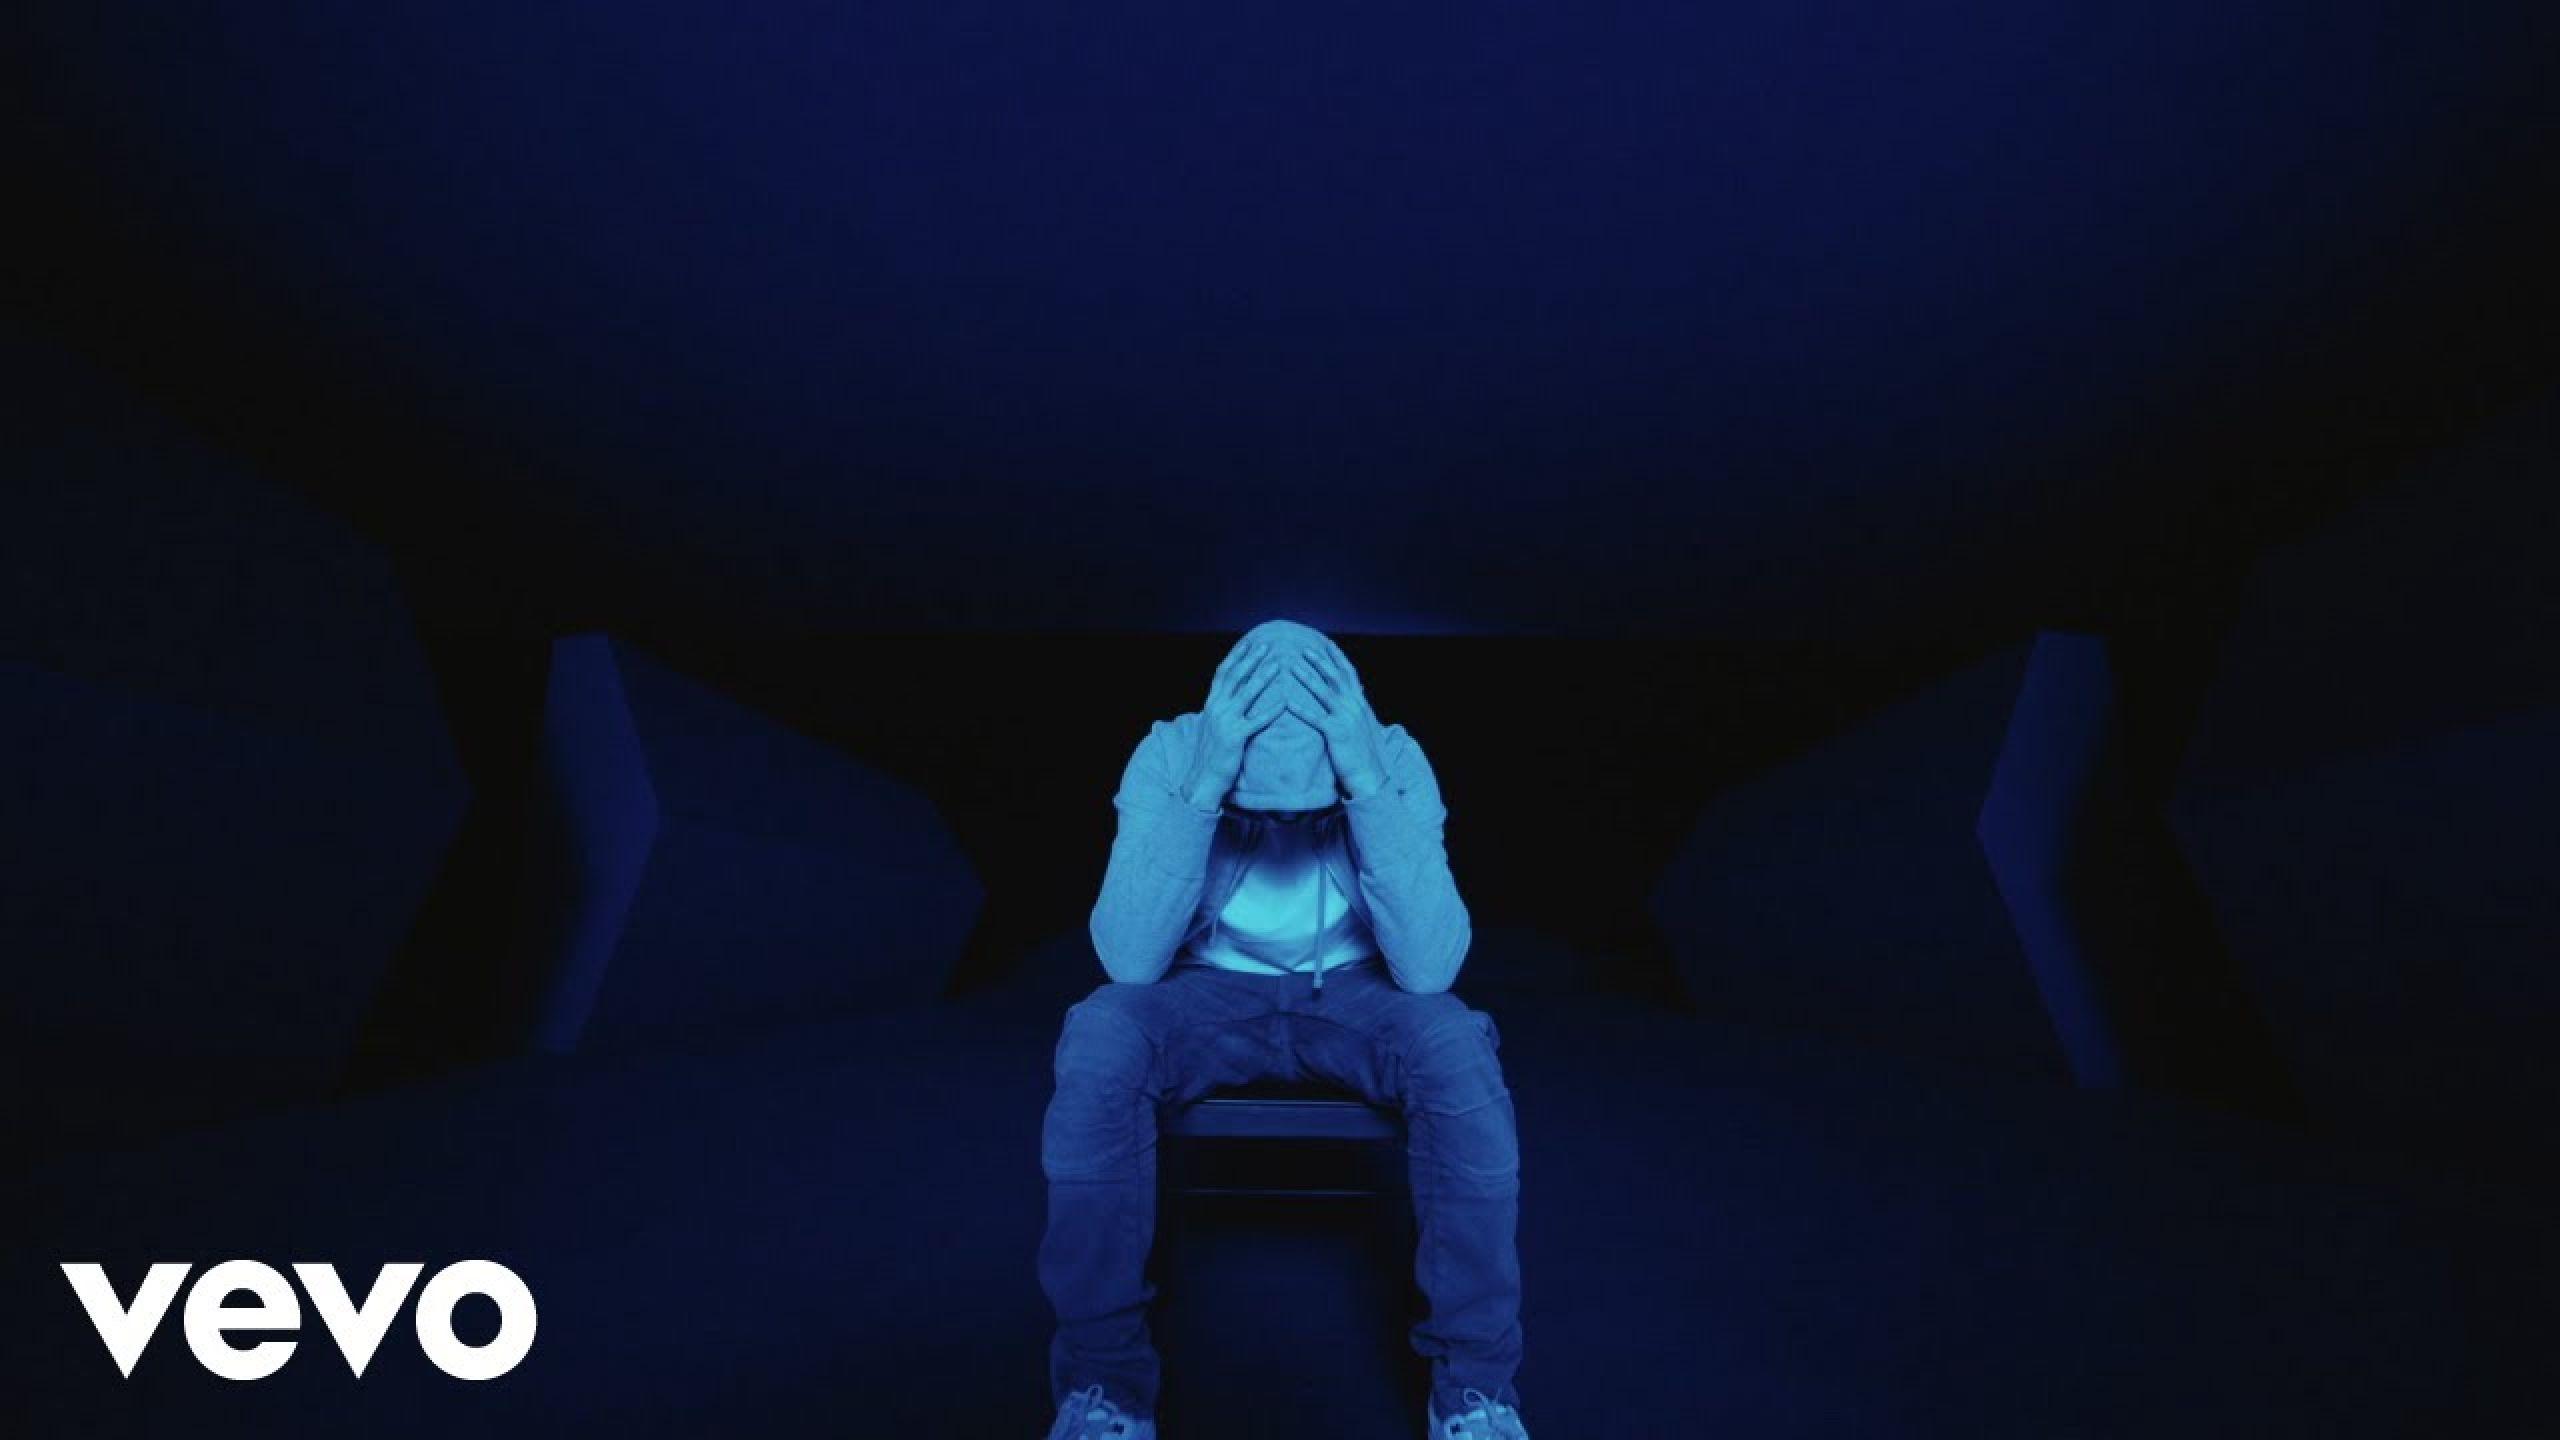 Eminem - Darkness (Official Video)